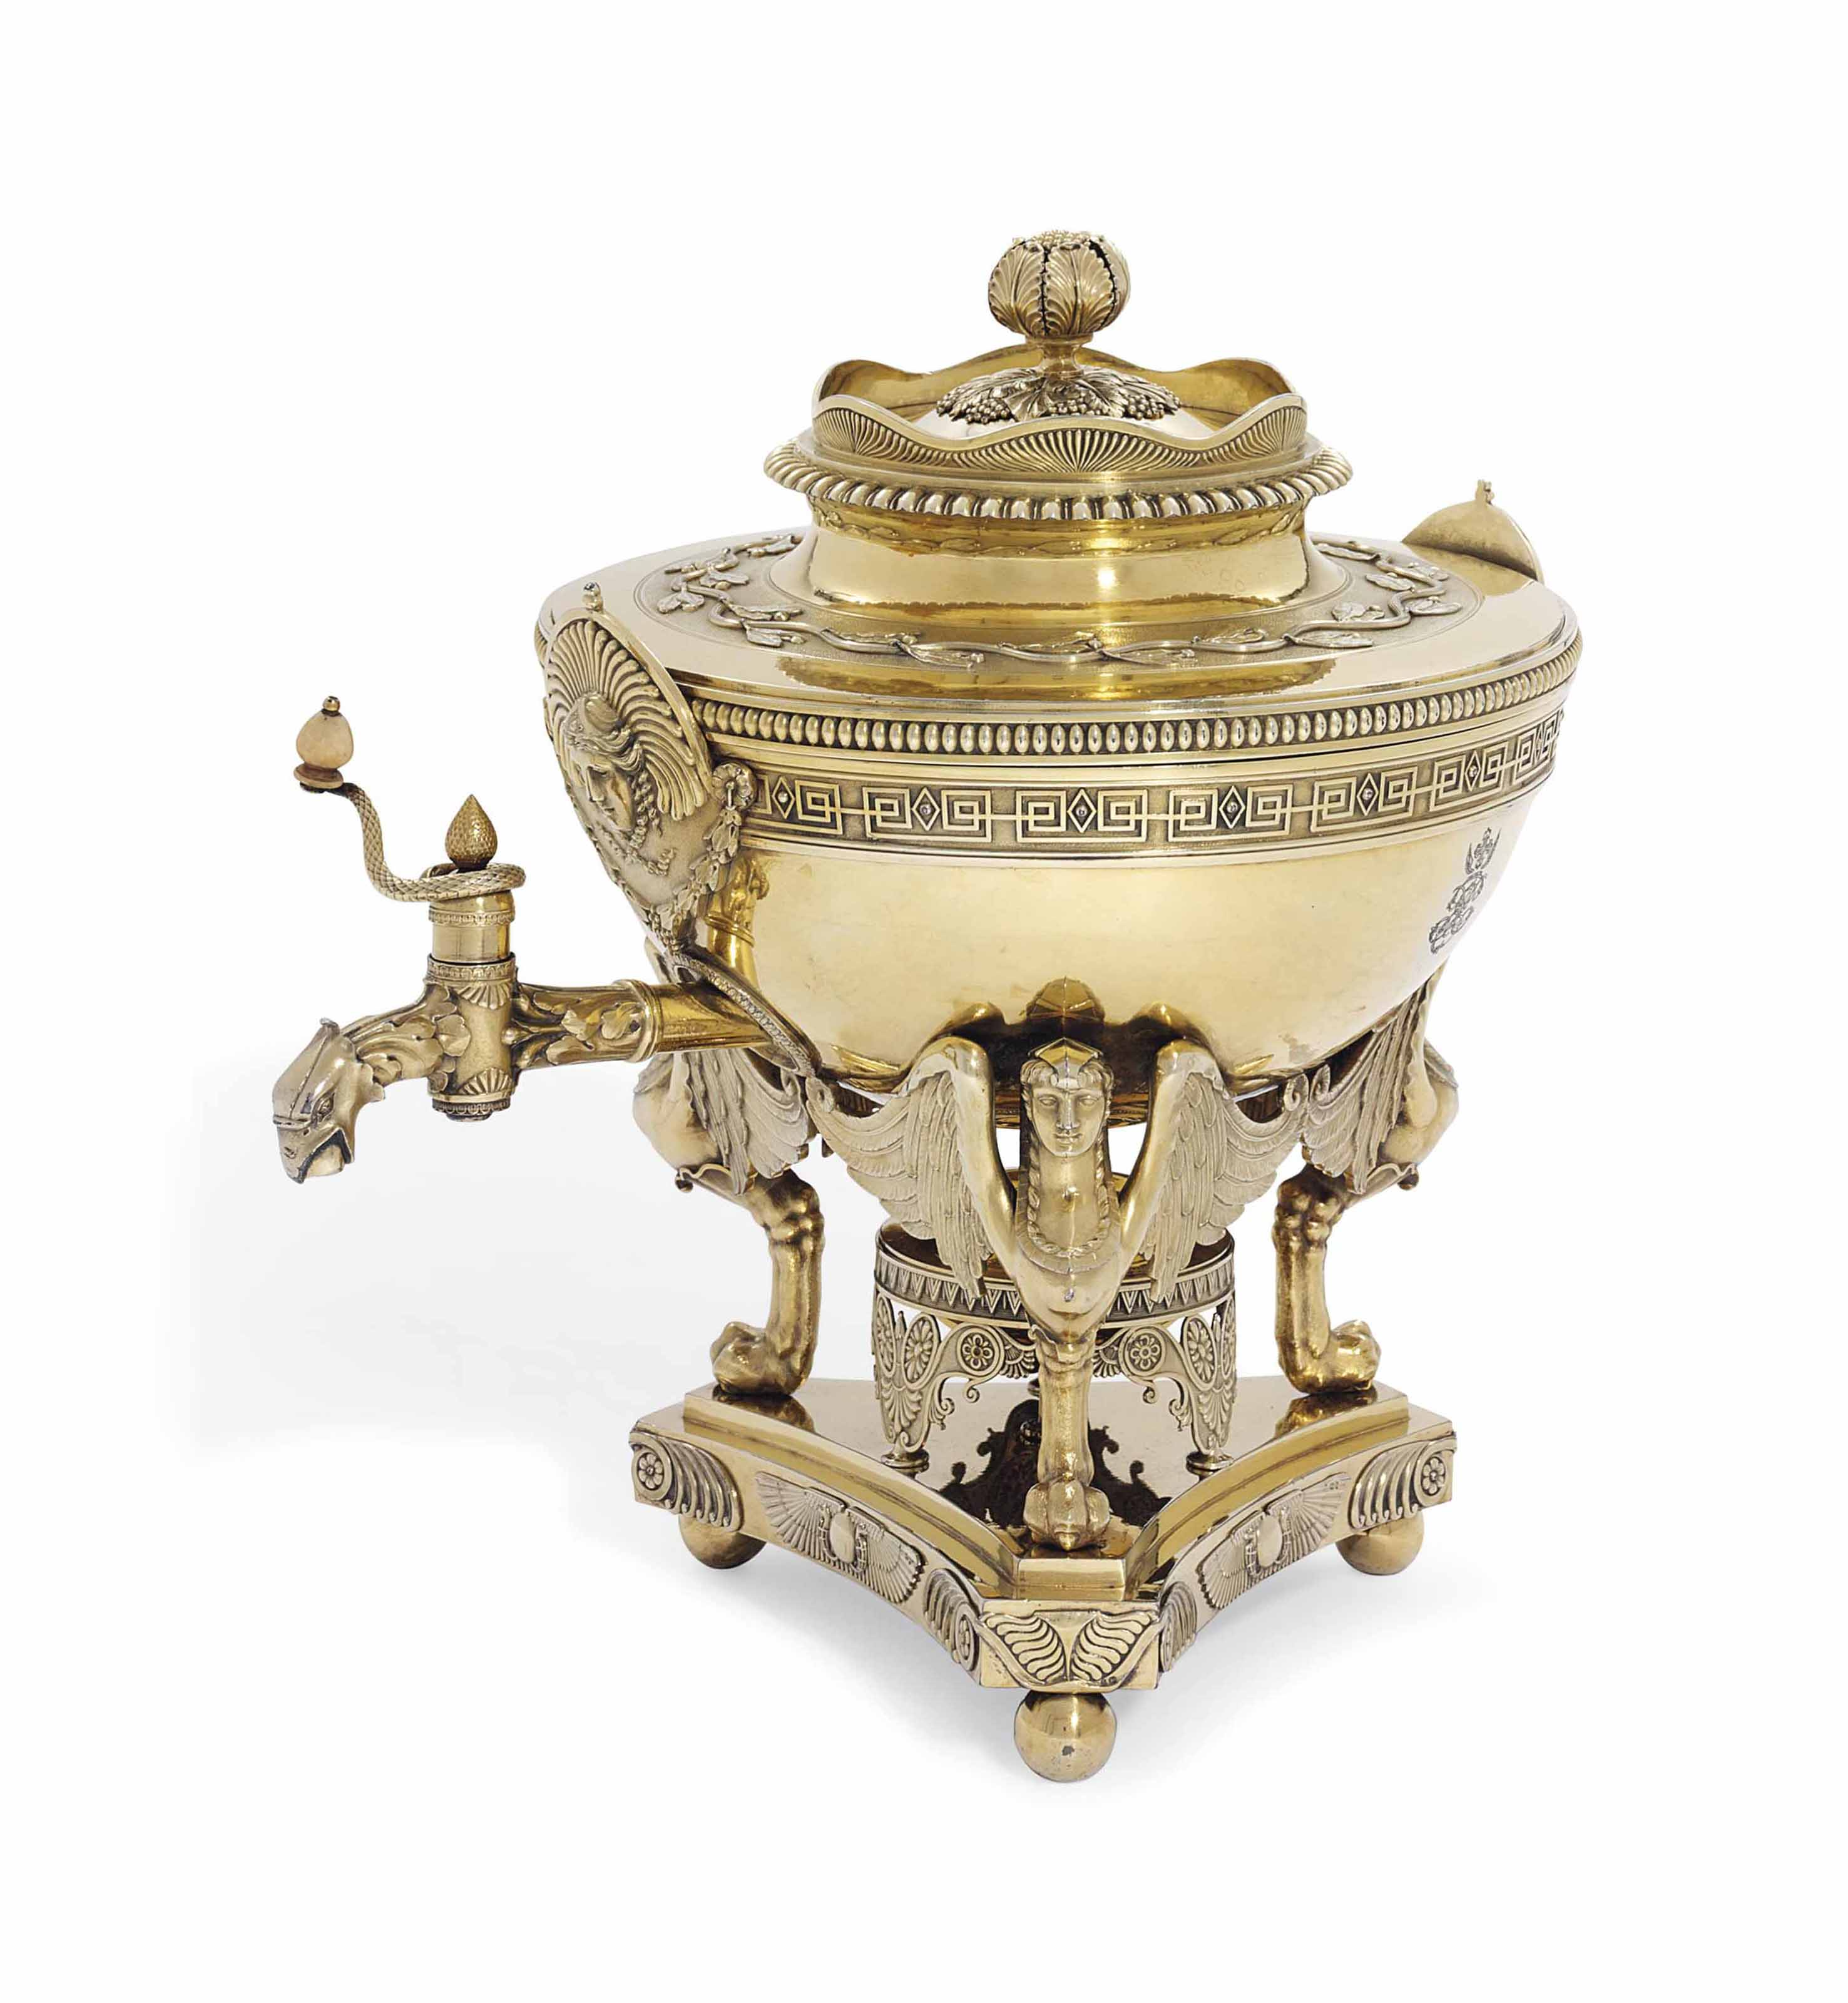 A GEORGE III SILVER-GILT TEA-URN